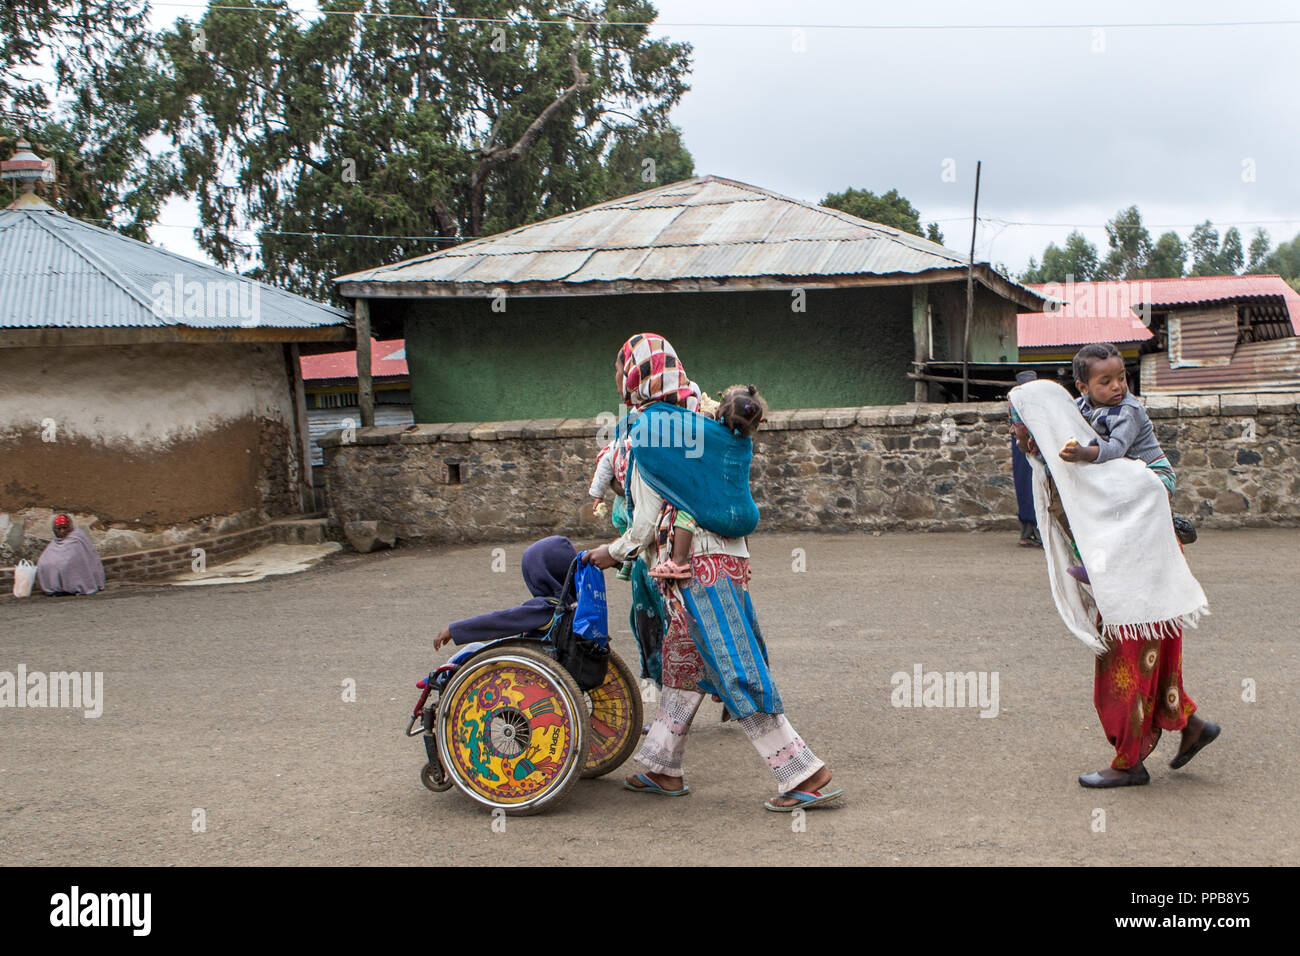 Grounds of Maryam or St. Mary's Church, Entoto Hill, Addis Ababa, Ethiopia - Stock Image